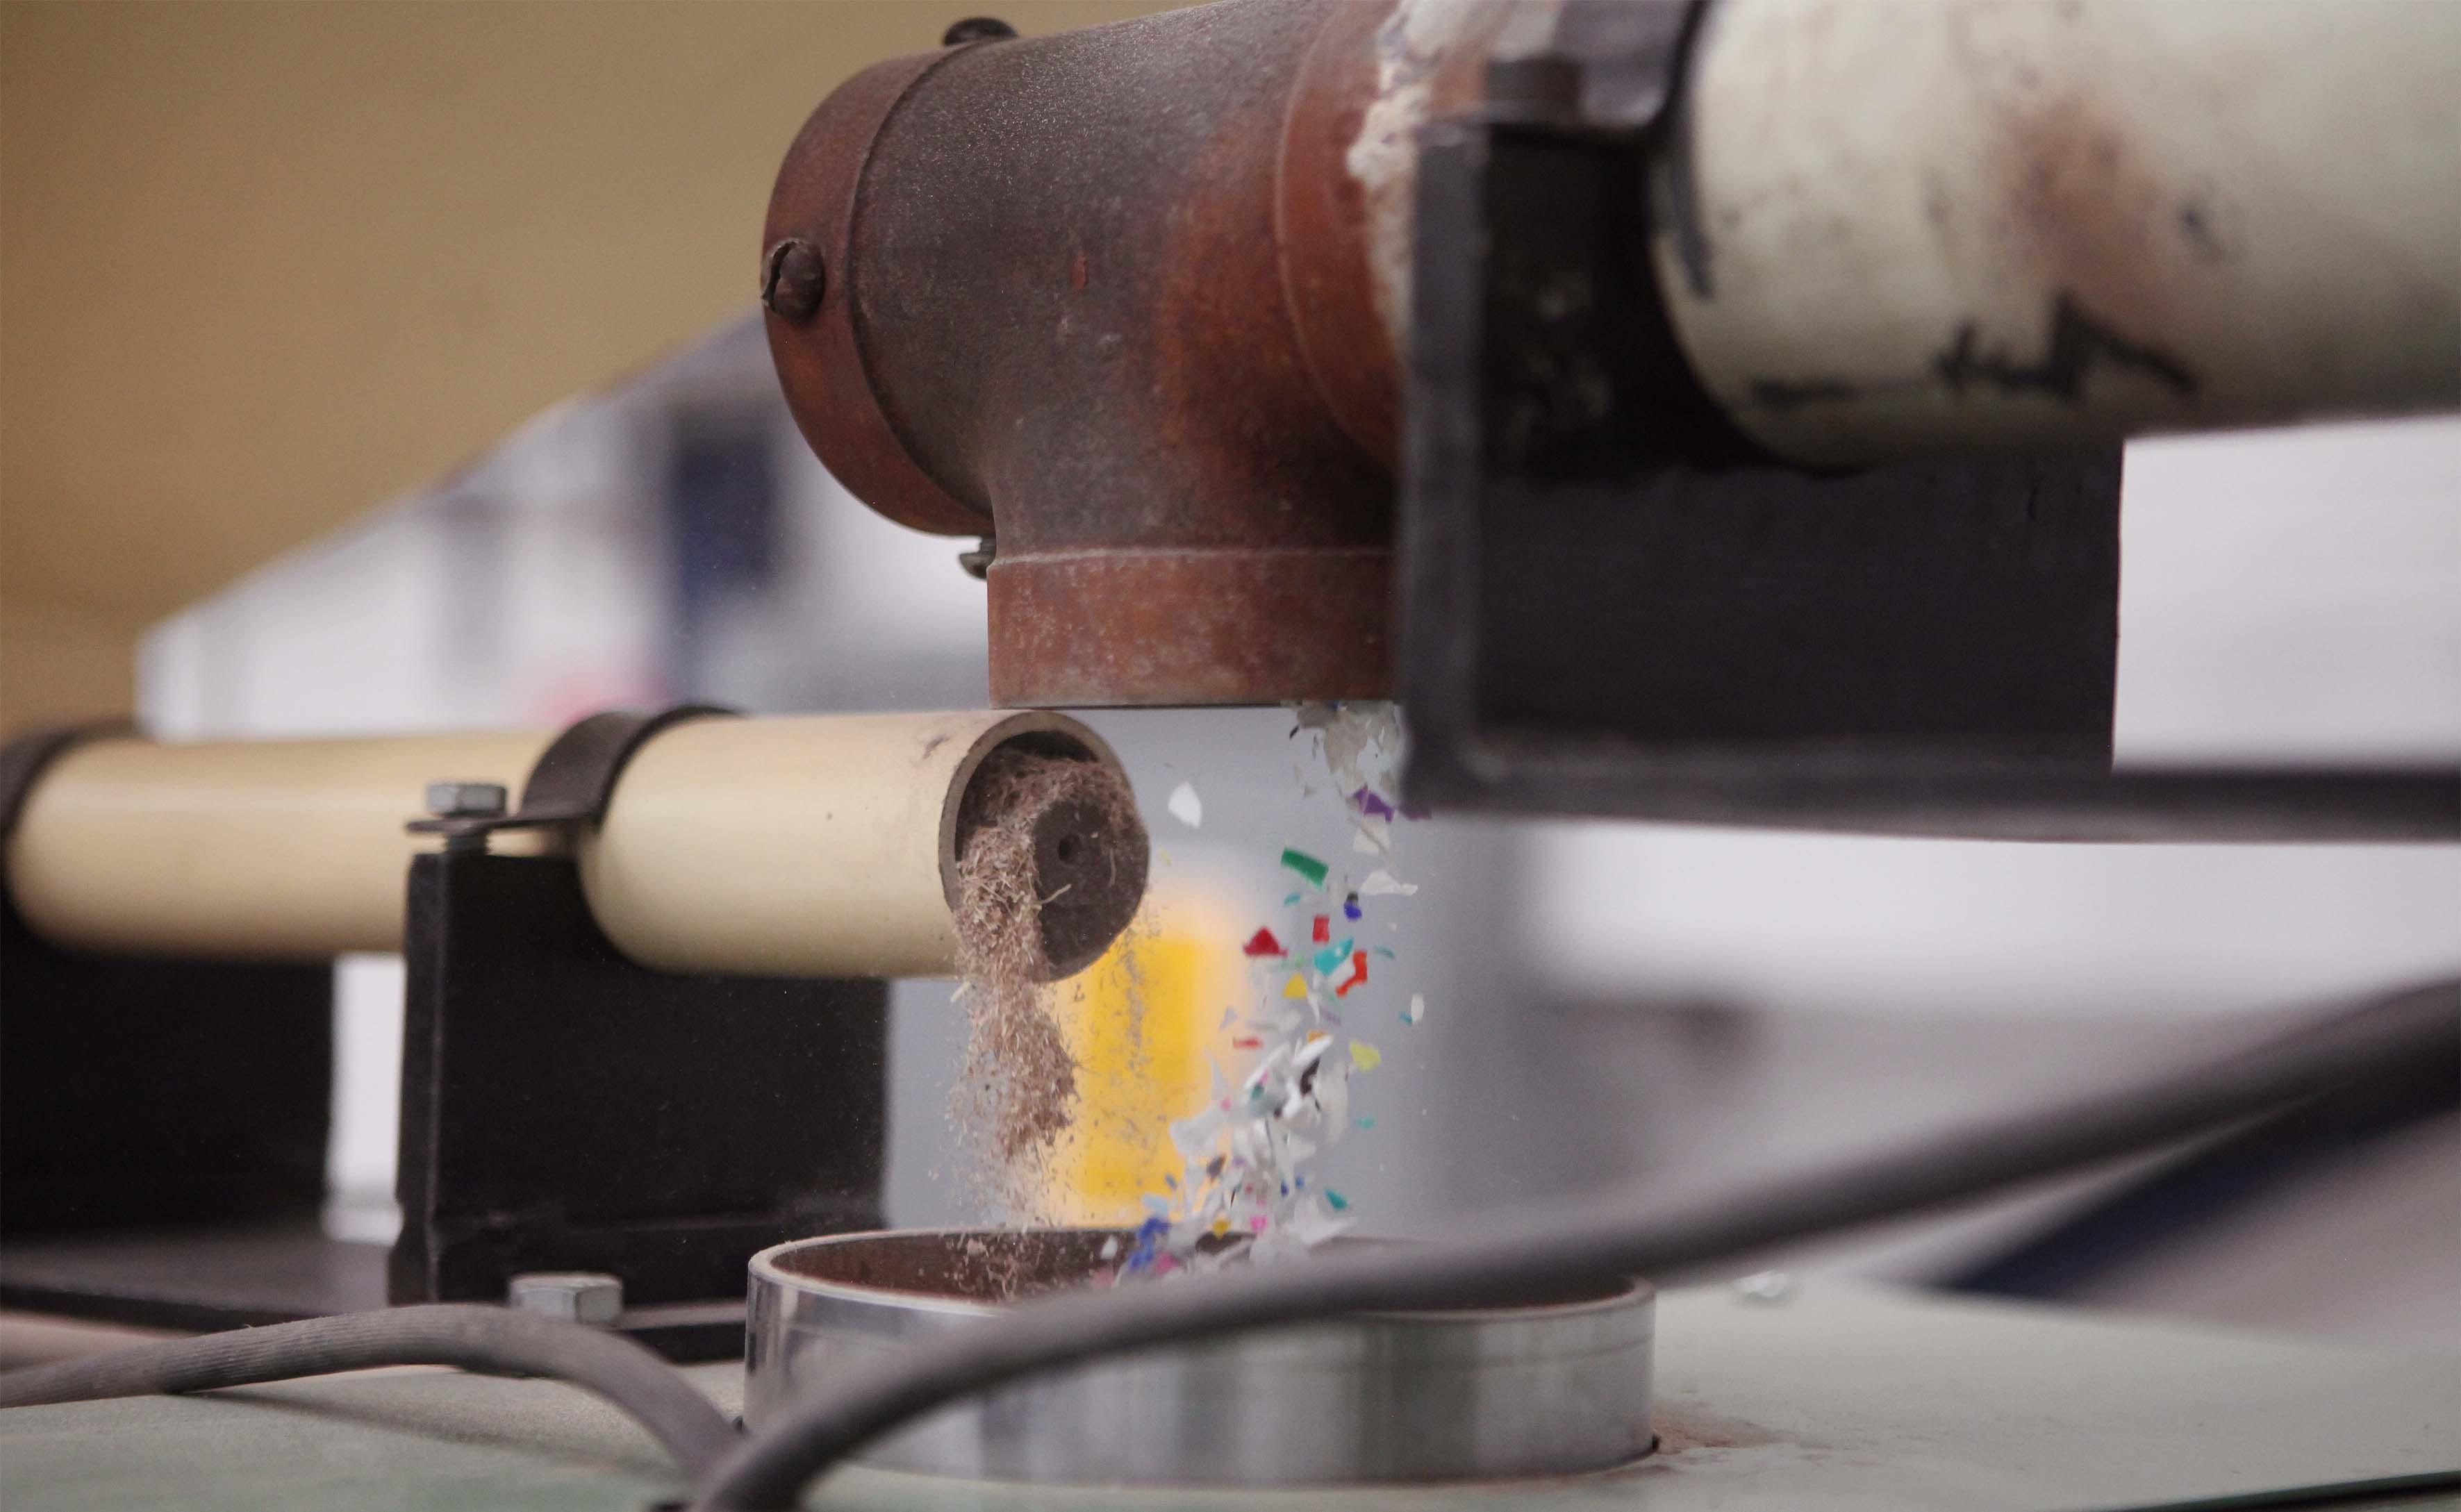 Material plastico saliendo de una maquina, ya triturado